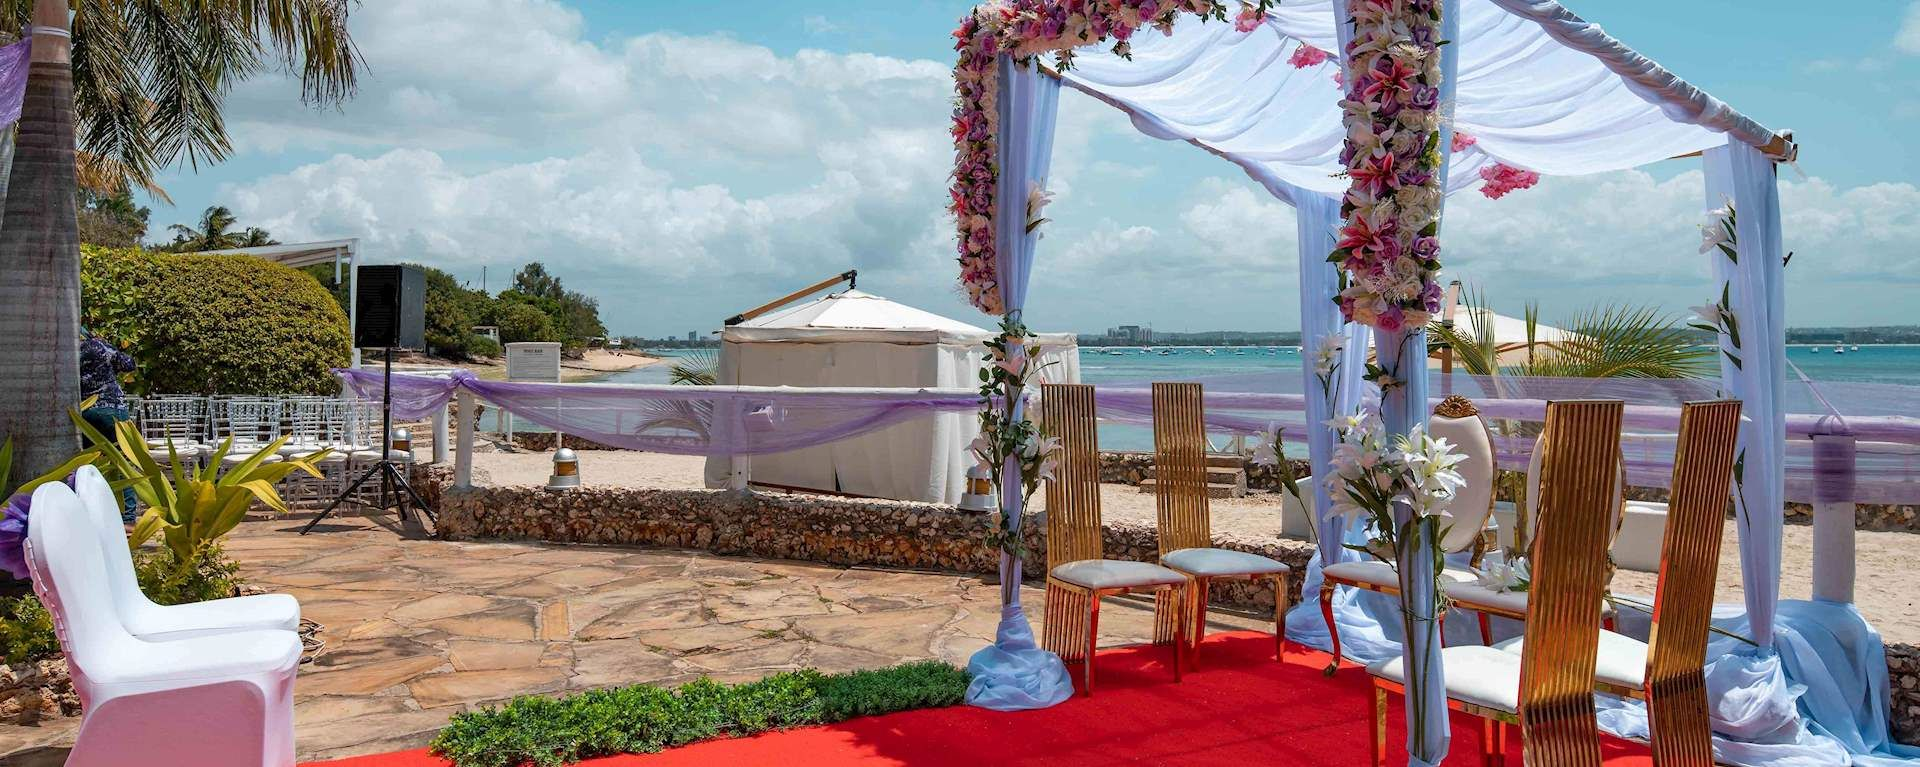 Best Western Coral Beach Hotel10